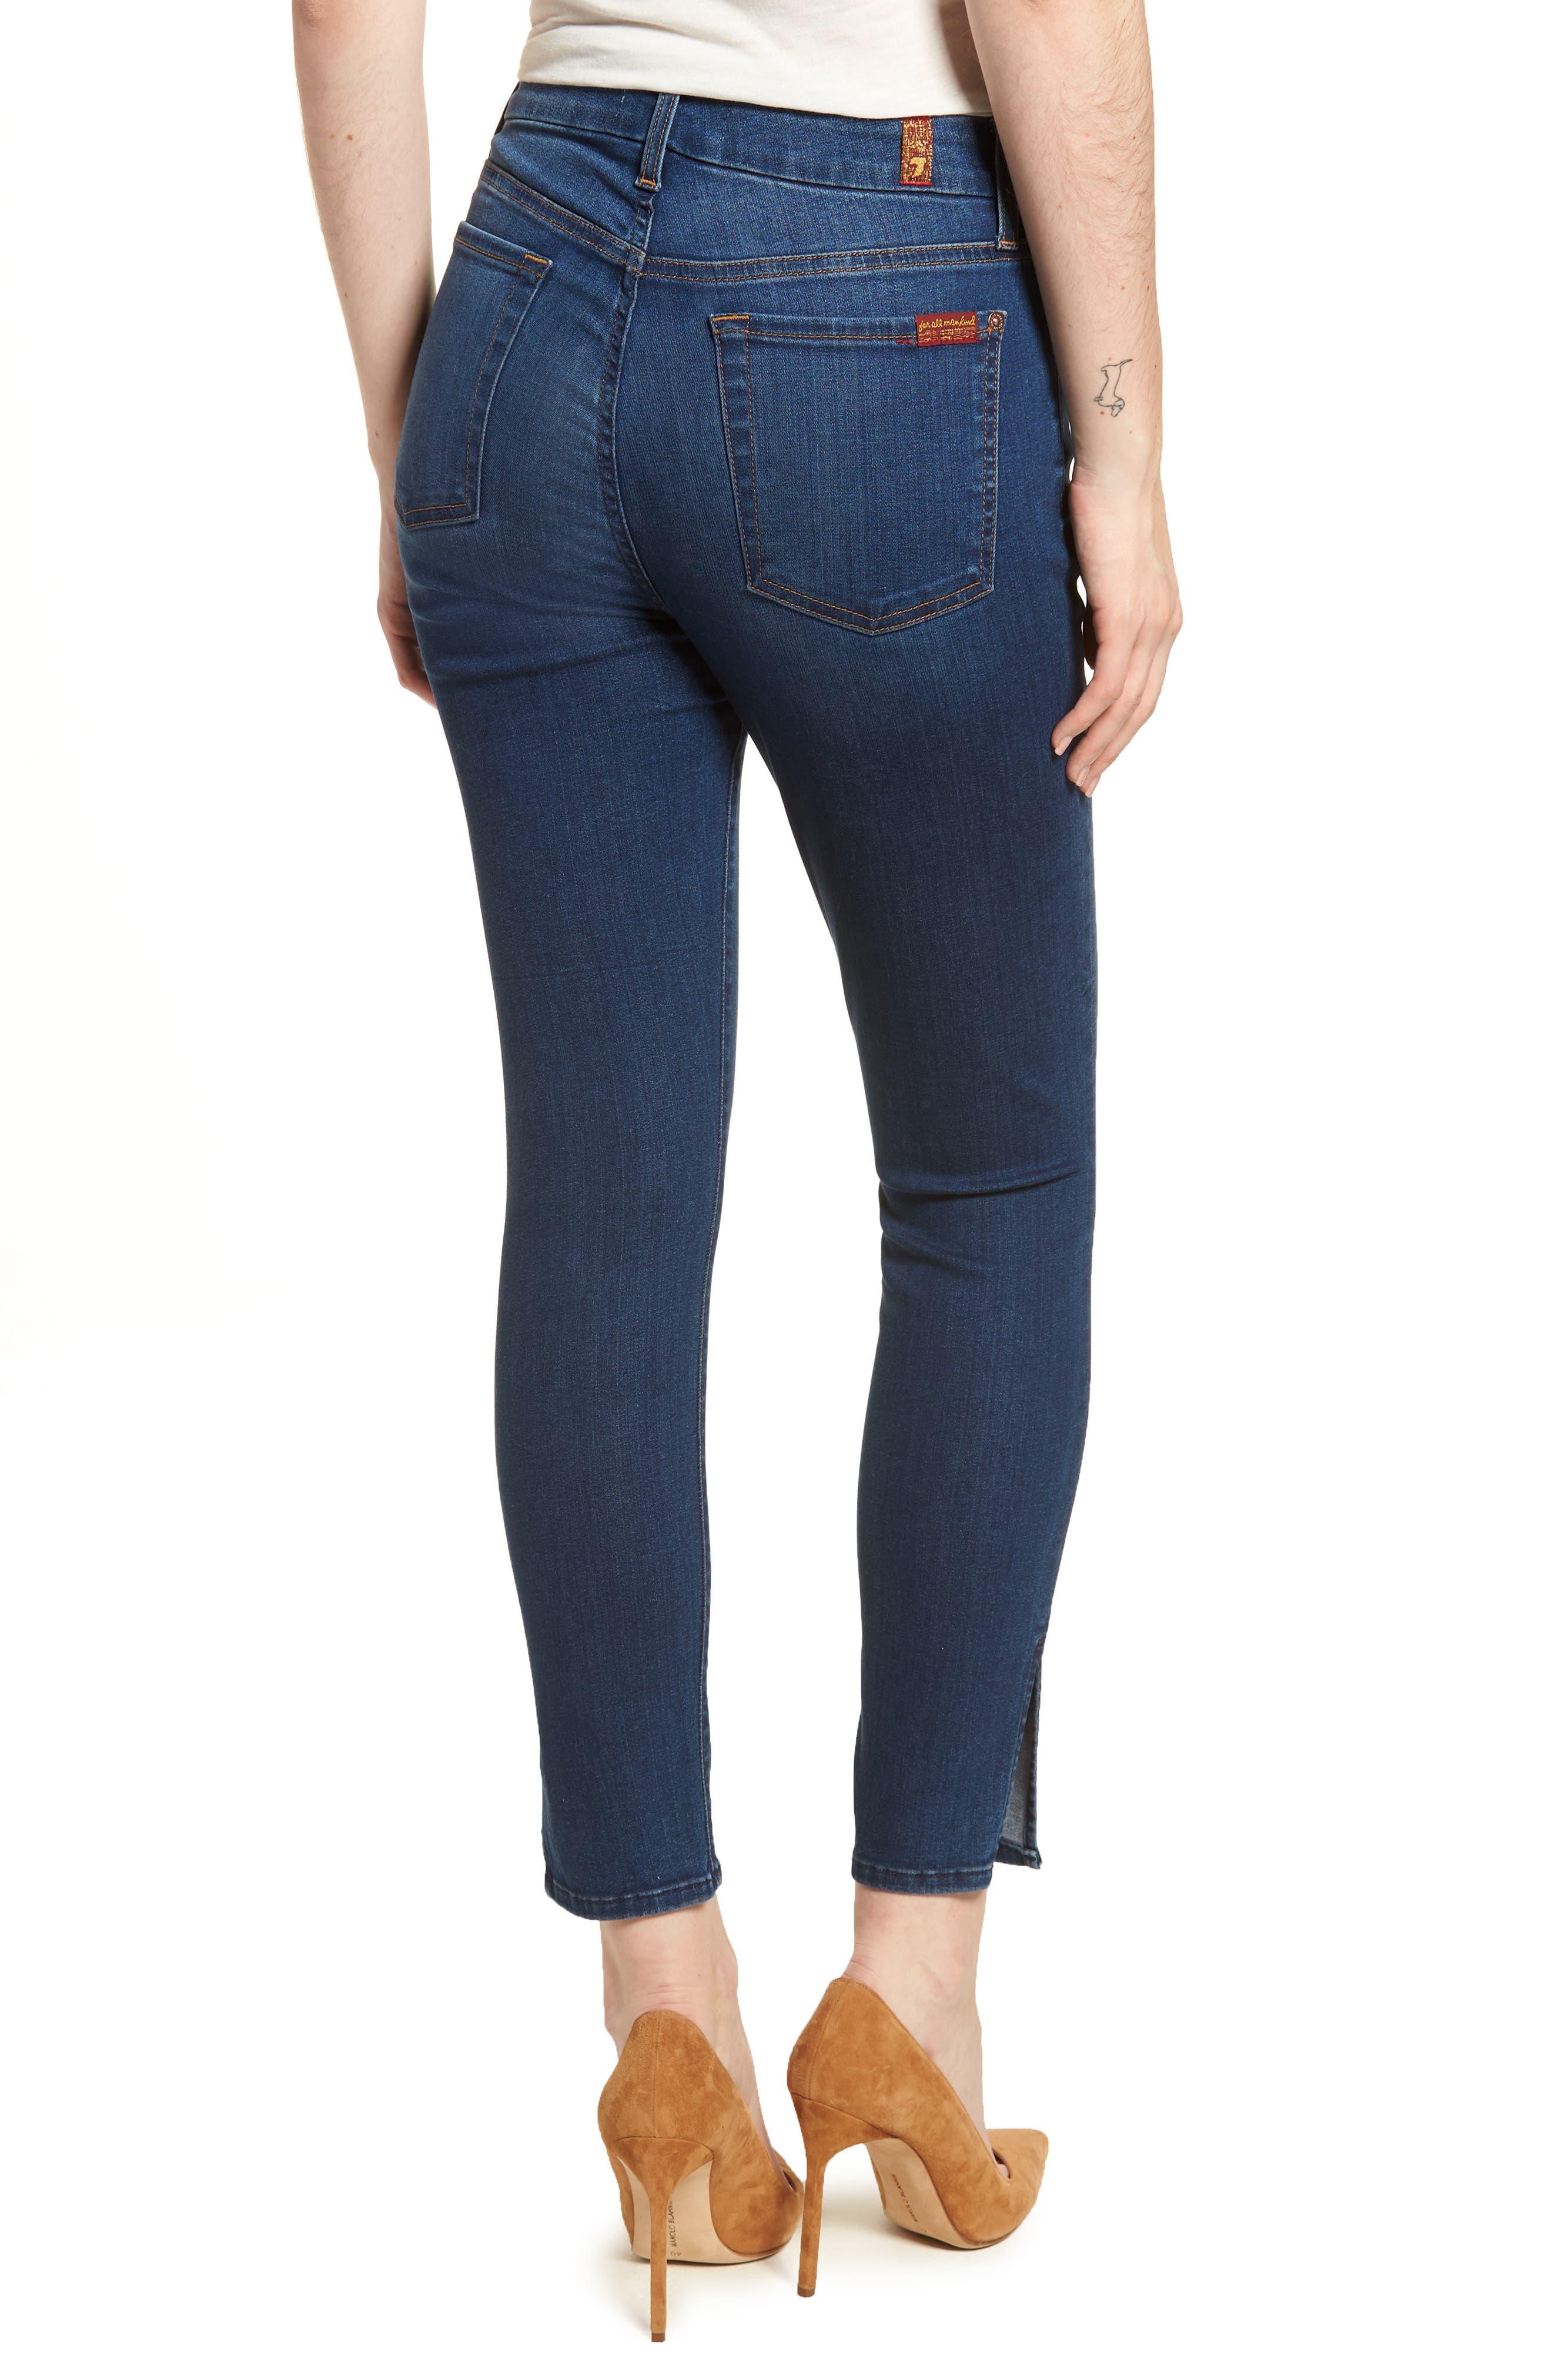 b(air) - Aubrey High Waist Skinny Jeans,                             Alternate thumbnail 2, color,                             Bair Fresh Rinse